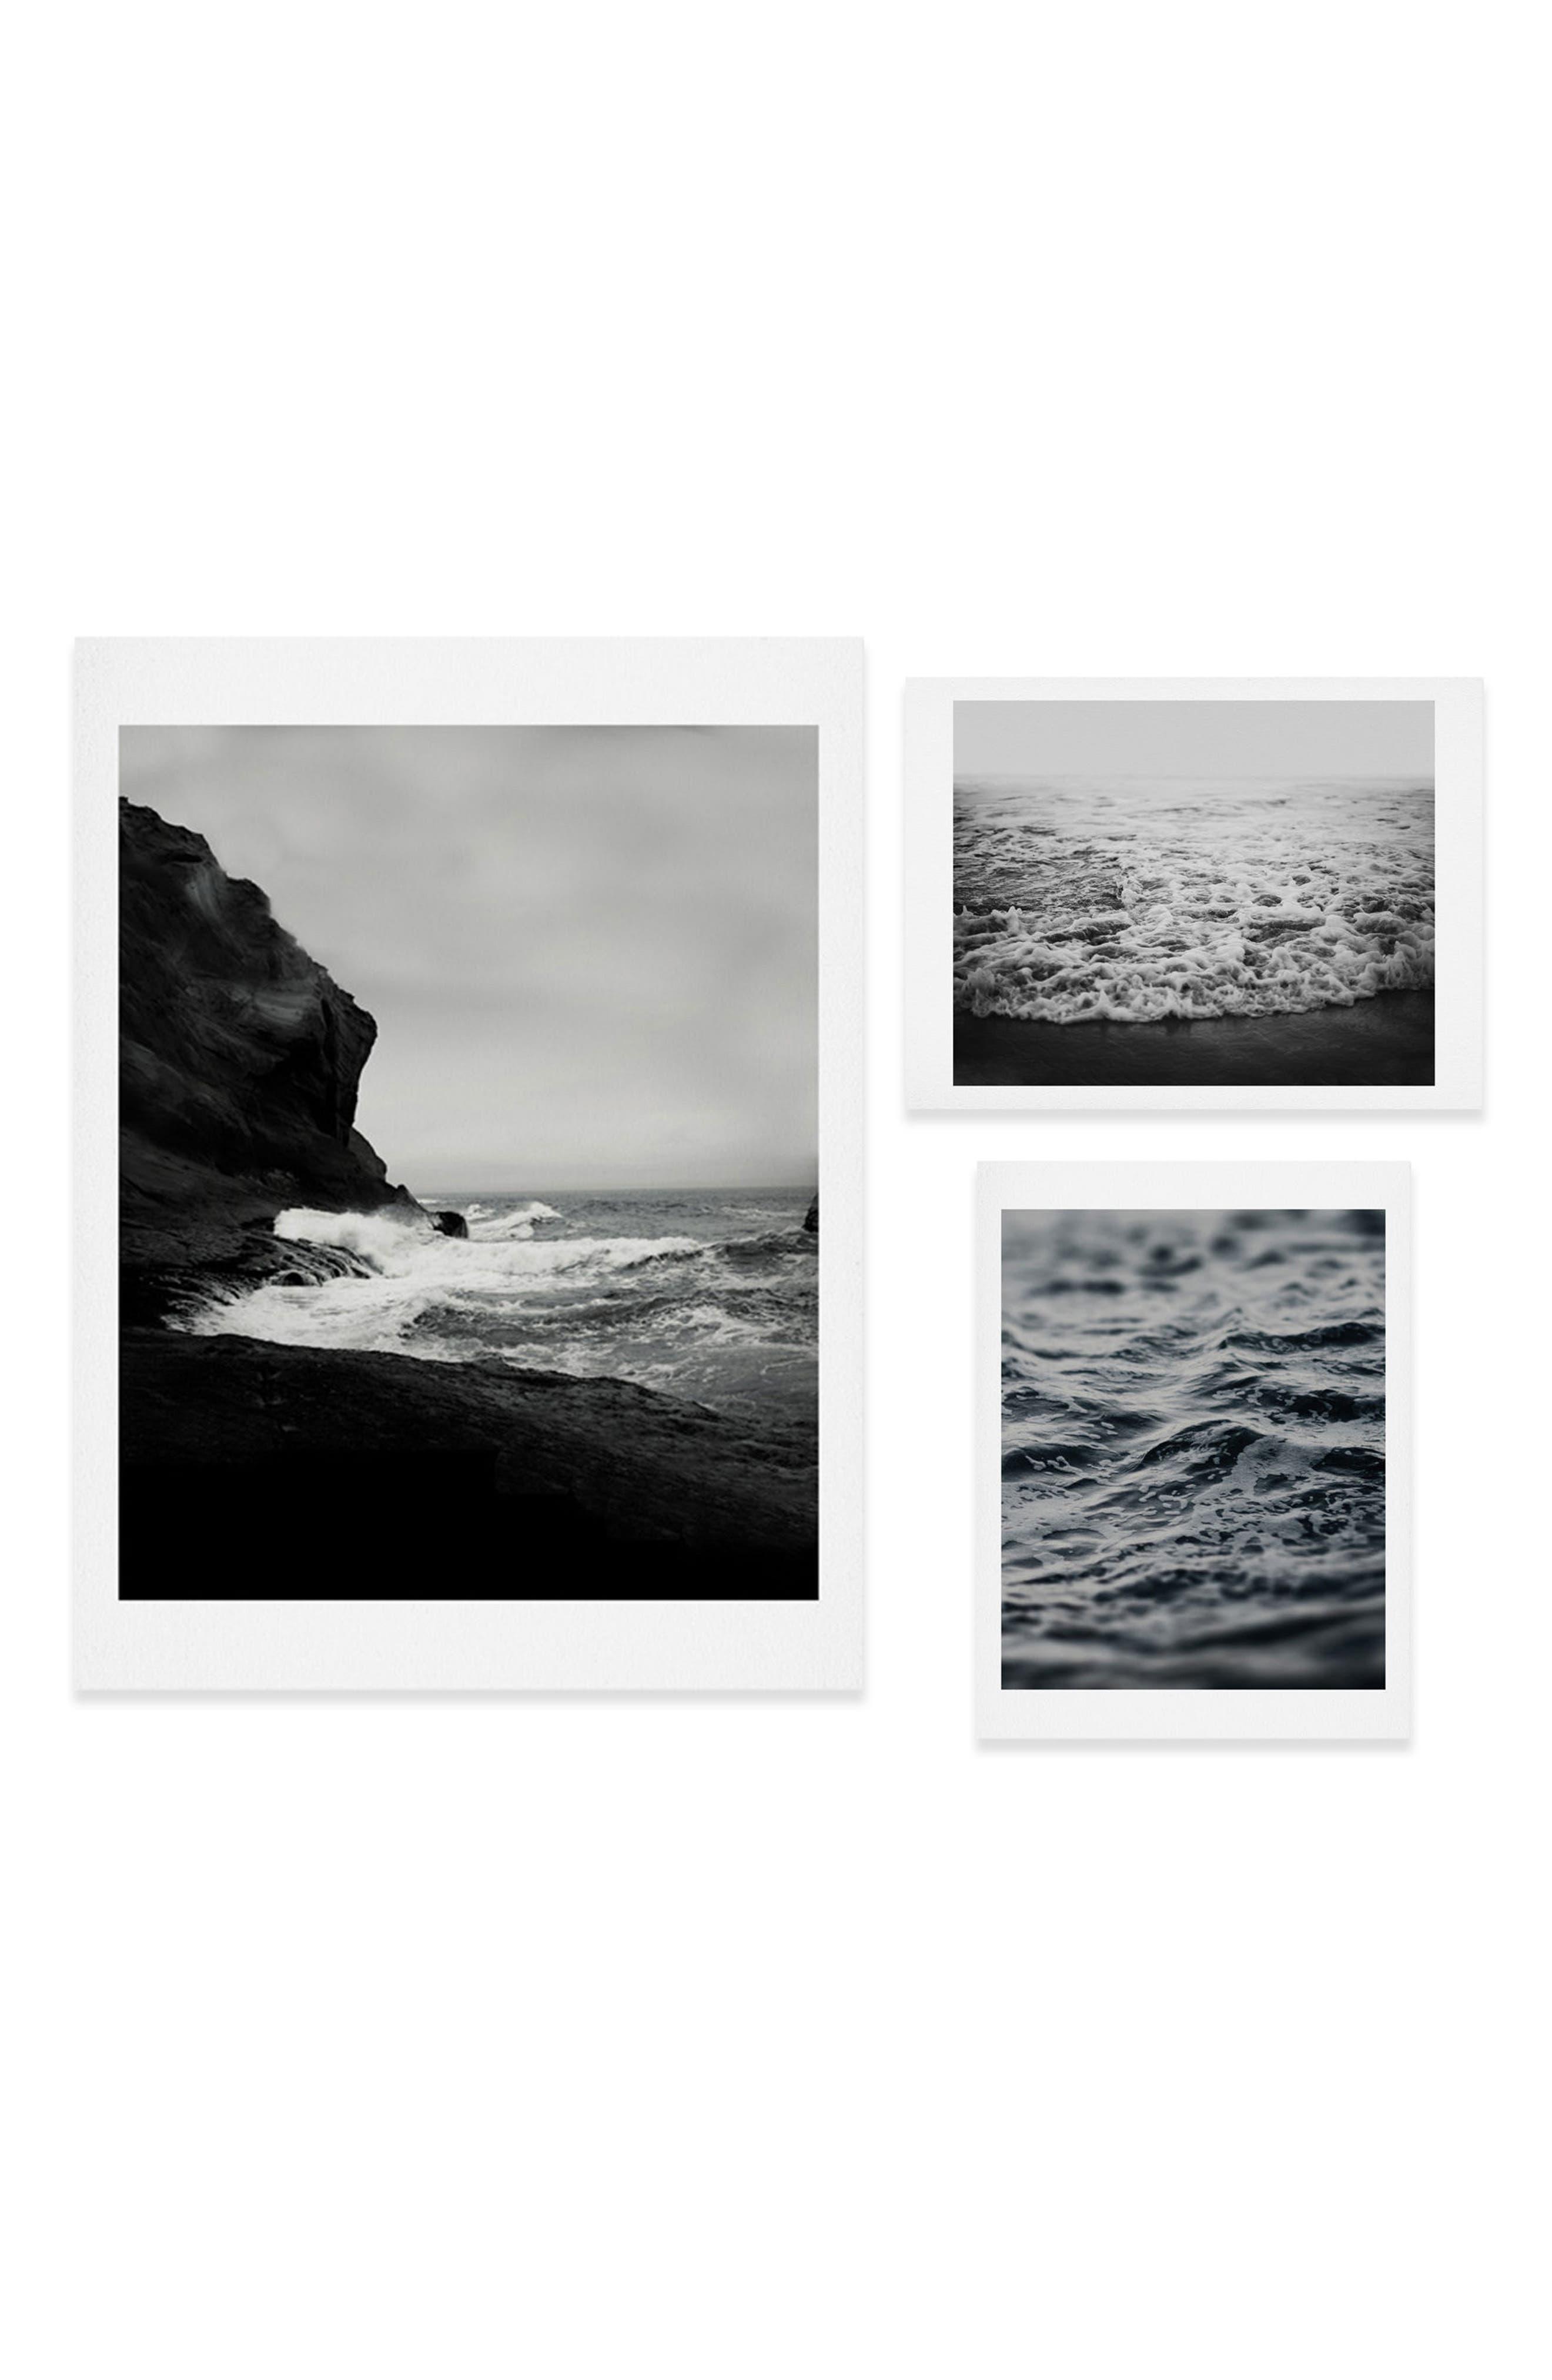 Waves Three-Piece Gallery Wall Art Print Set,                             Main thumbnail 1, color,                             BLACK/ WHITE